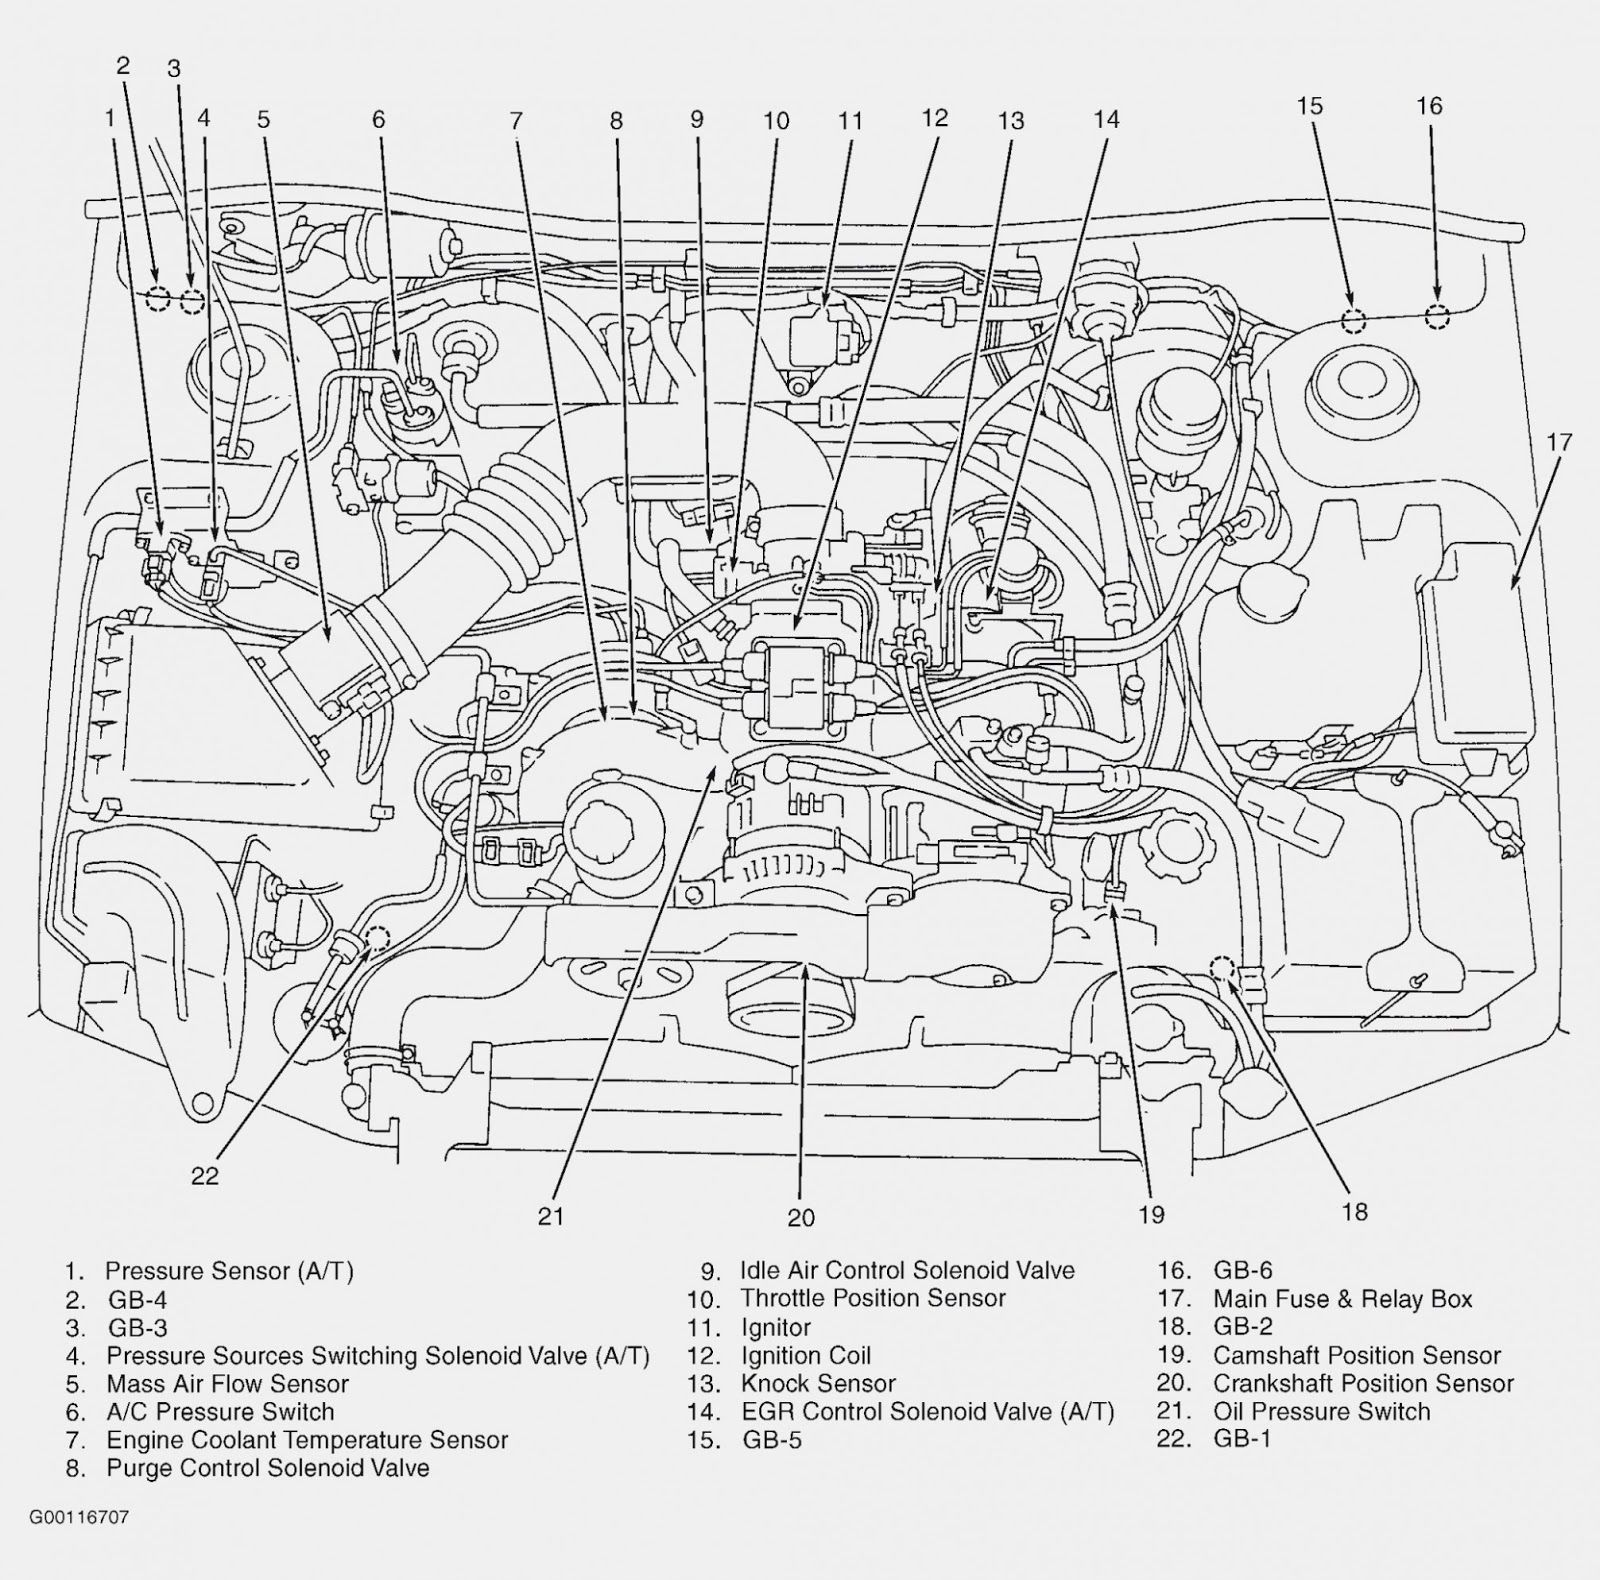 B7 Tribeca Wiring Schematic Diagram 2006 Subaru Outback Engine 7 Image In 2021 Subaru Legacy Subaru Outback Subaru